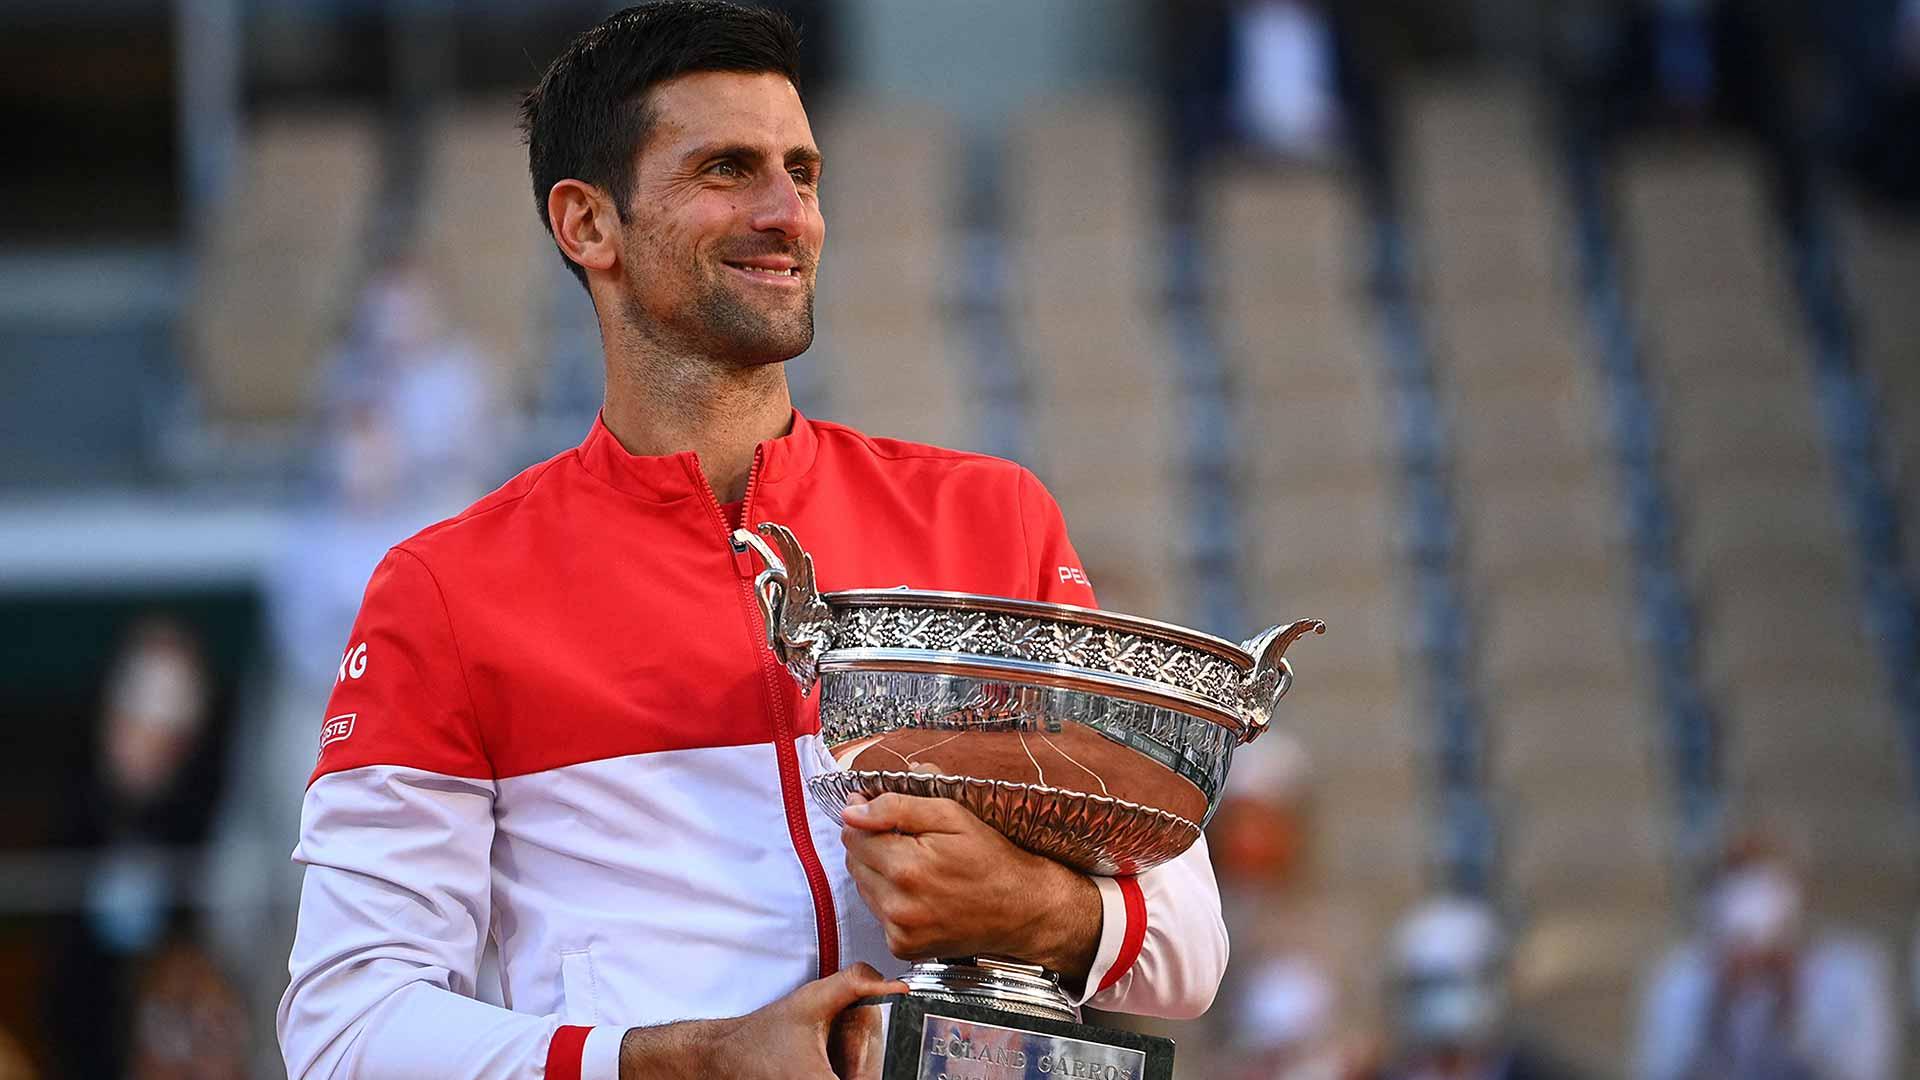 Djokovic Regains Race Lead As Nitto ATP Finals Battle Intensifies